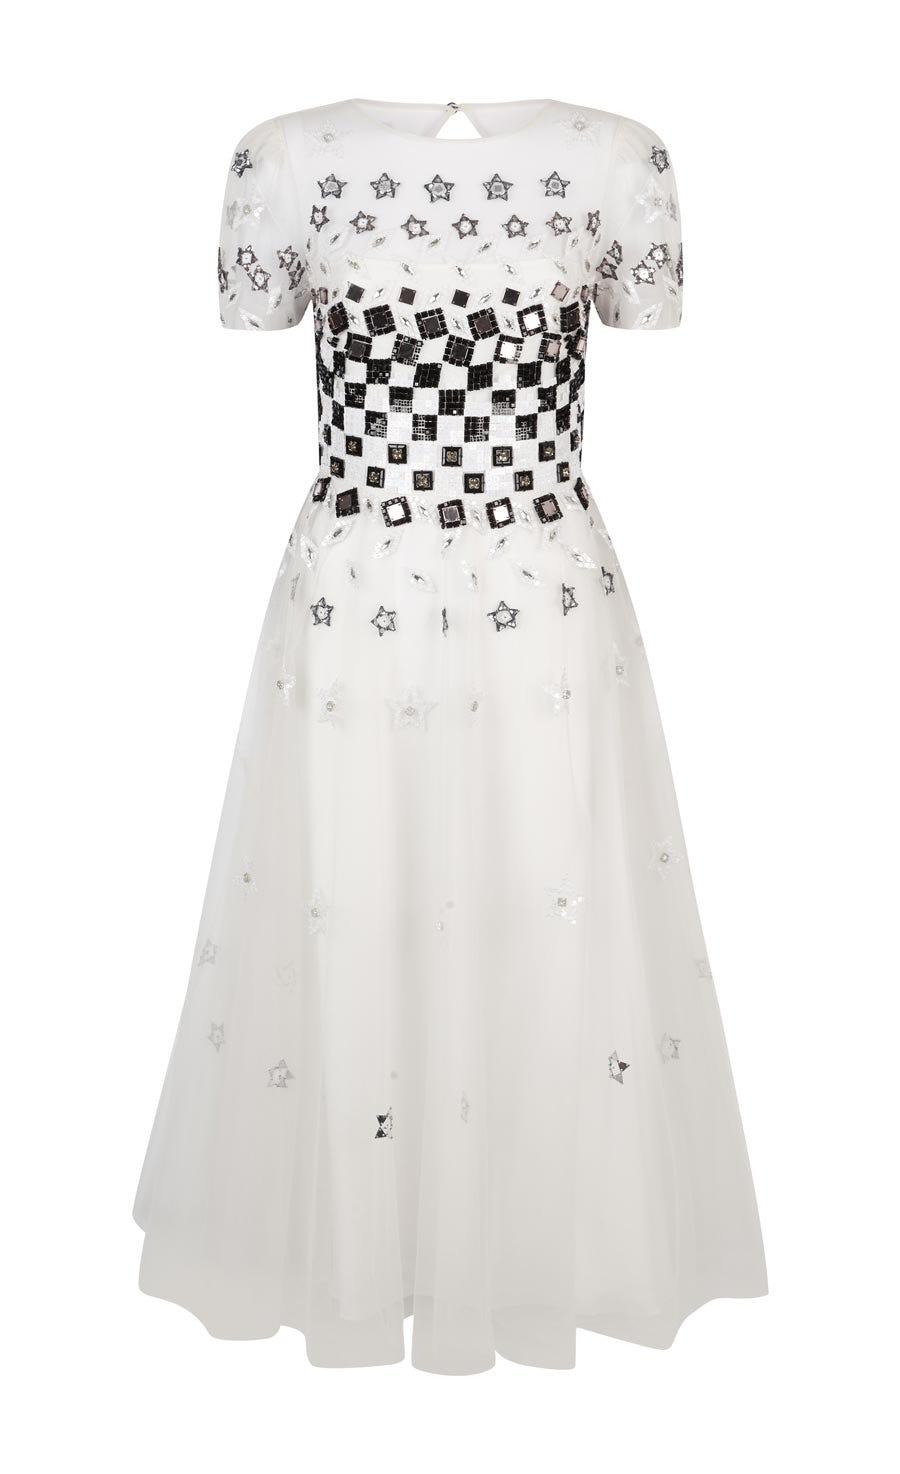 Splendour Gown